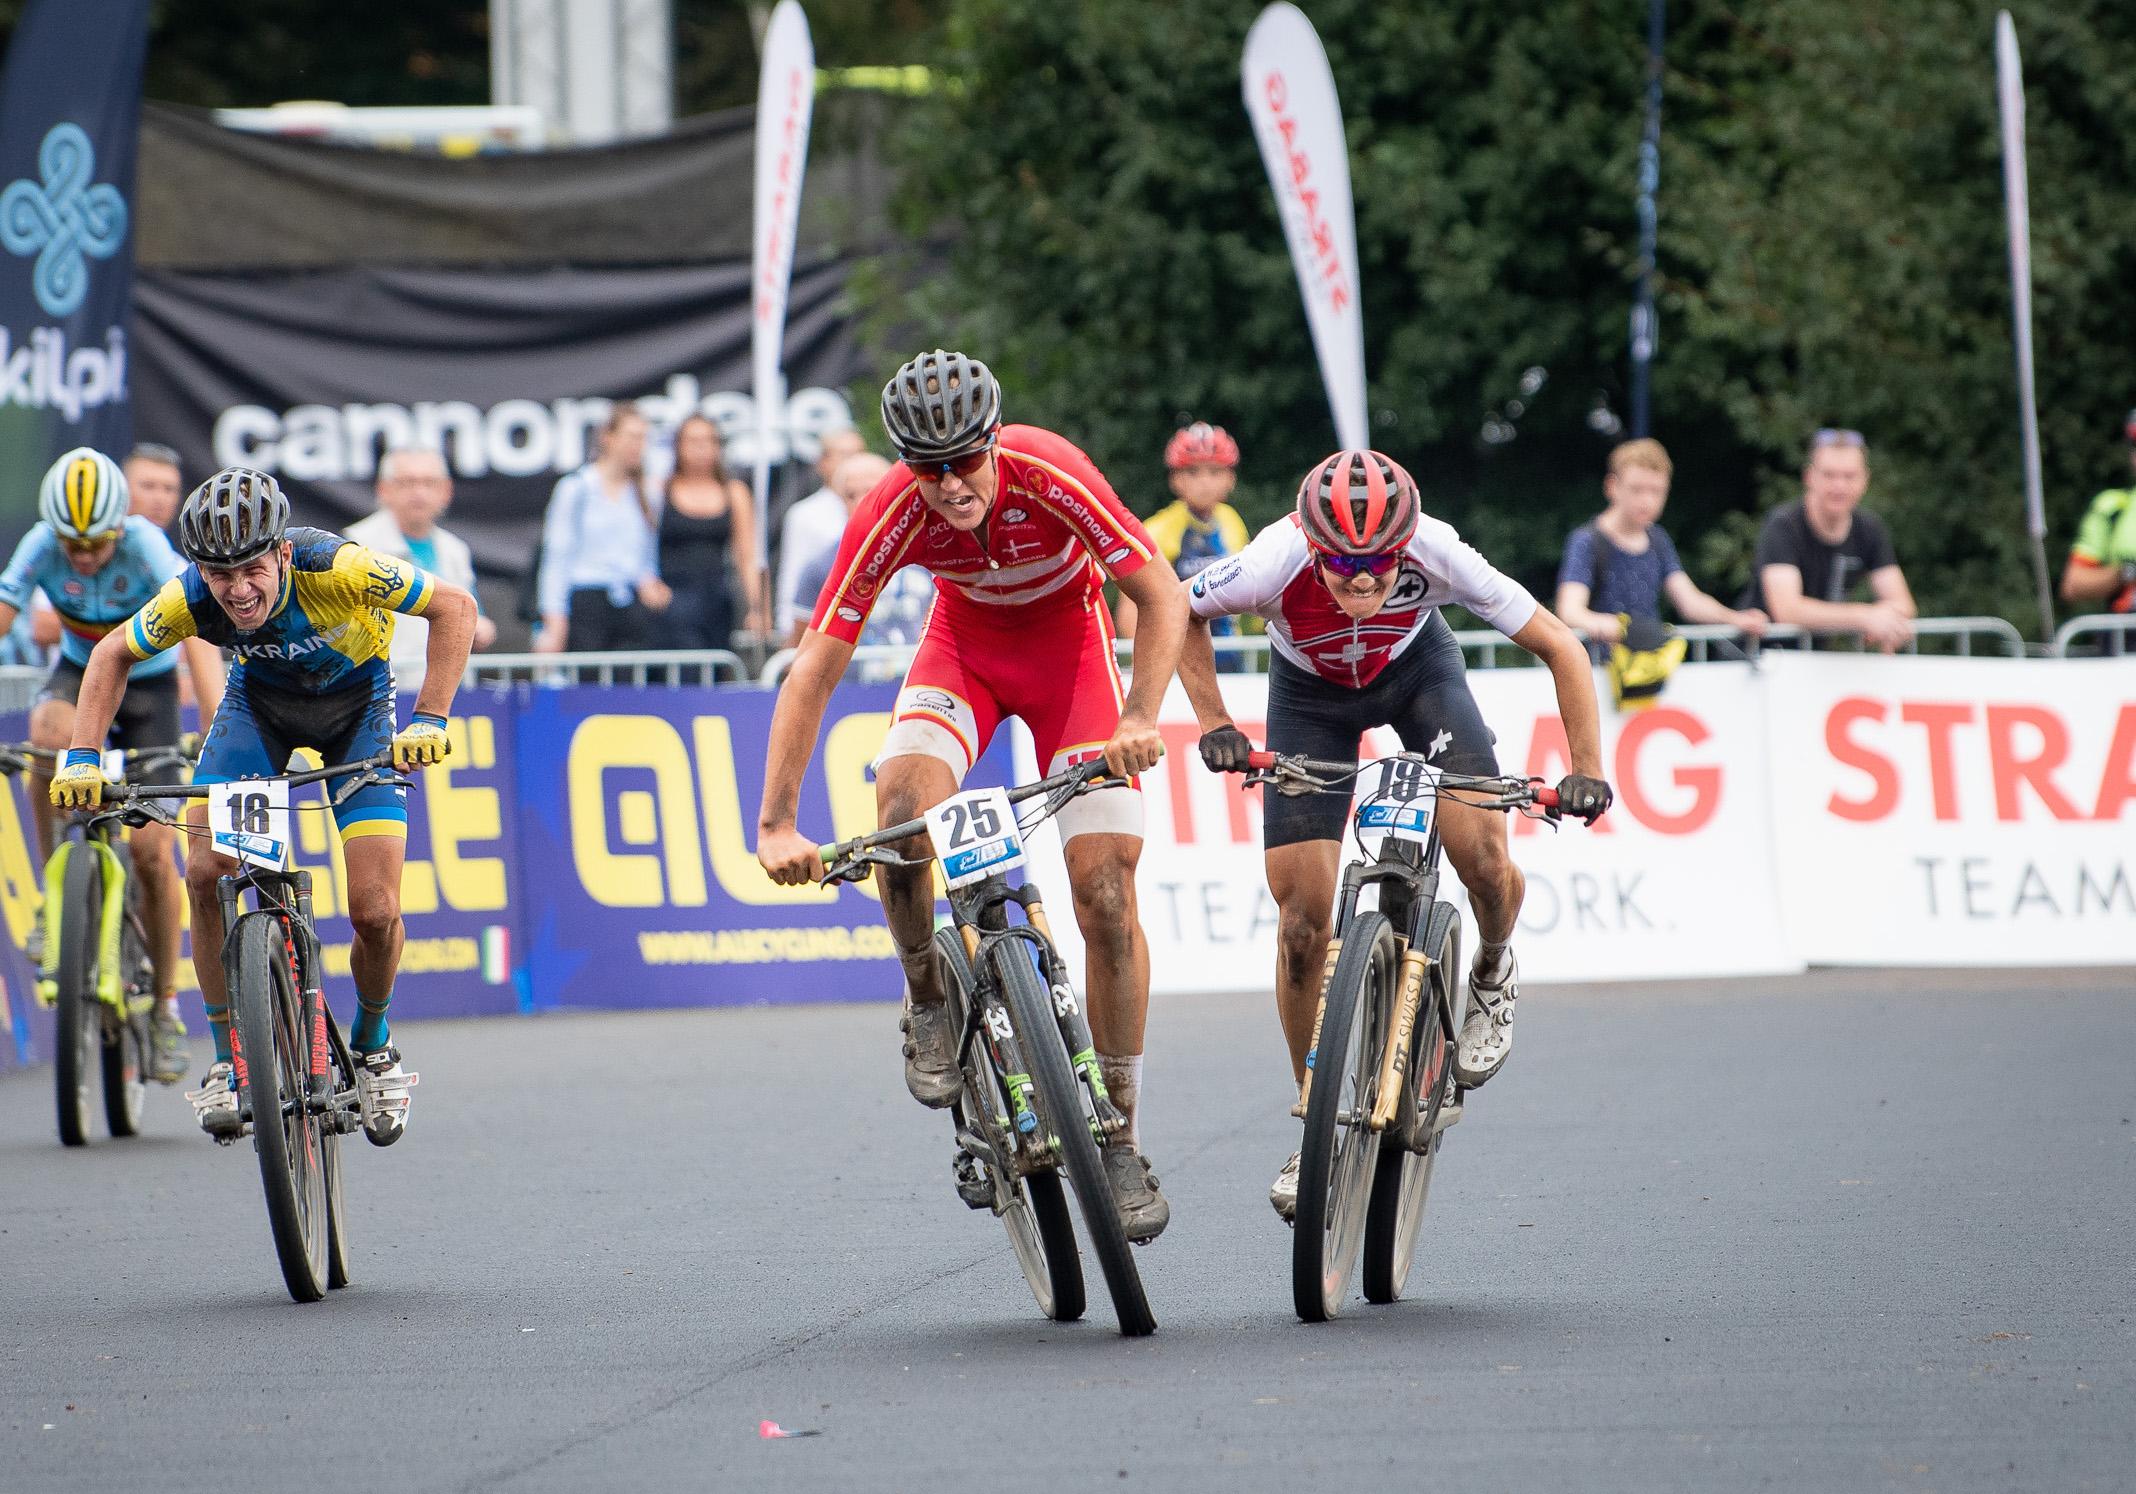 16, Moiseiev, Hennadii, , , UKR 25, Philipsen, Victor, , , DEN 19, Kluser, Tim, Bike Team Solothurn, Bbb Biel Bienne Bikers, SUI